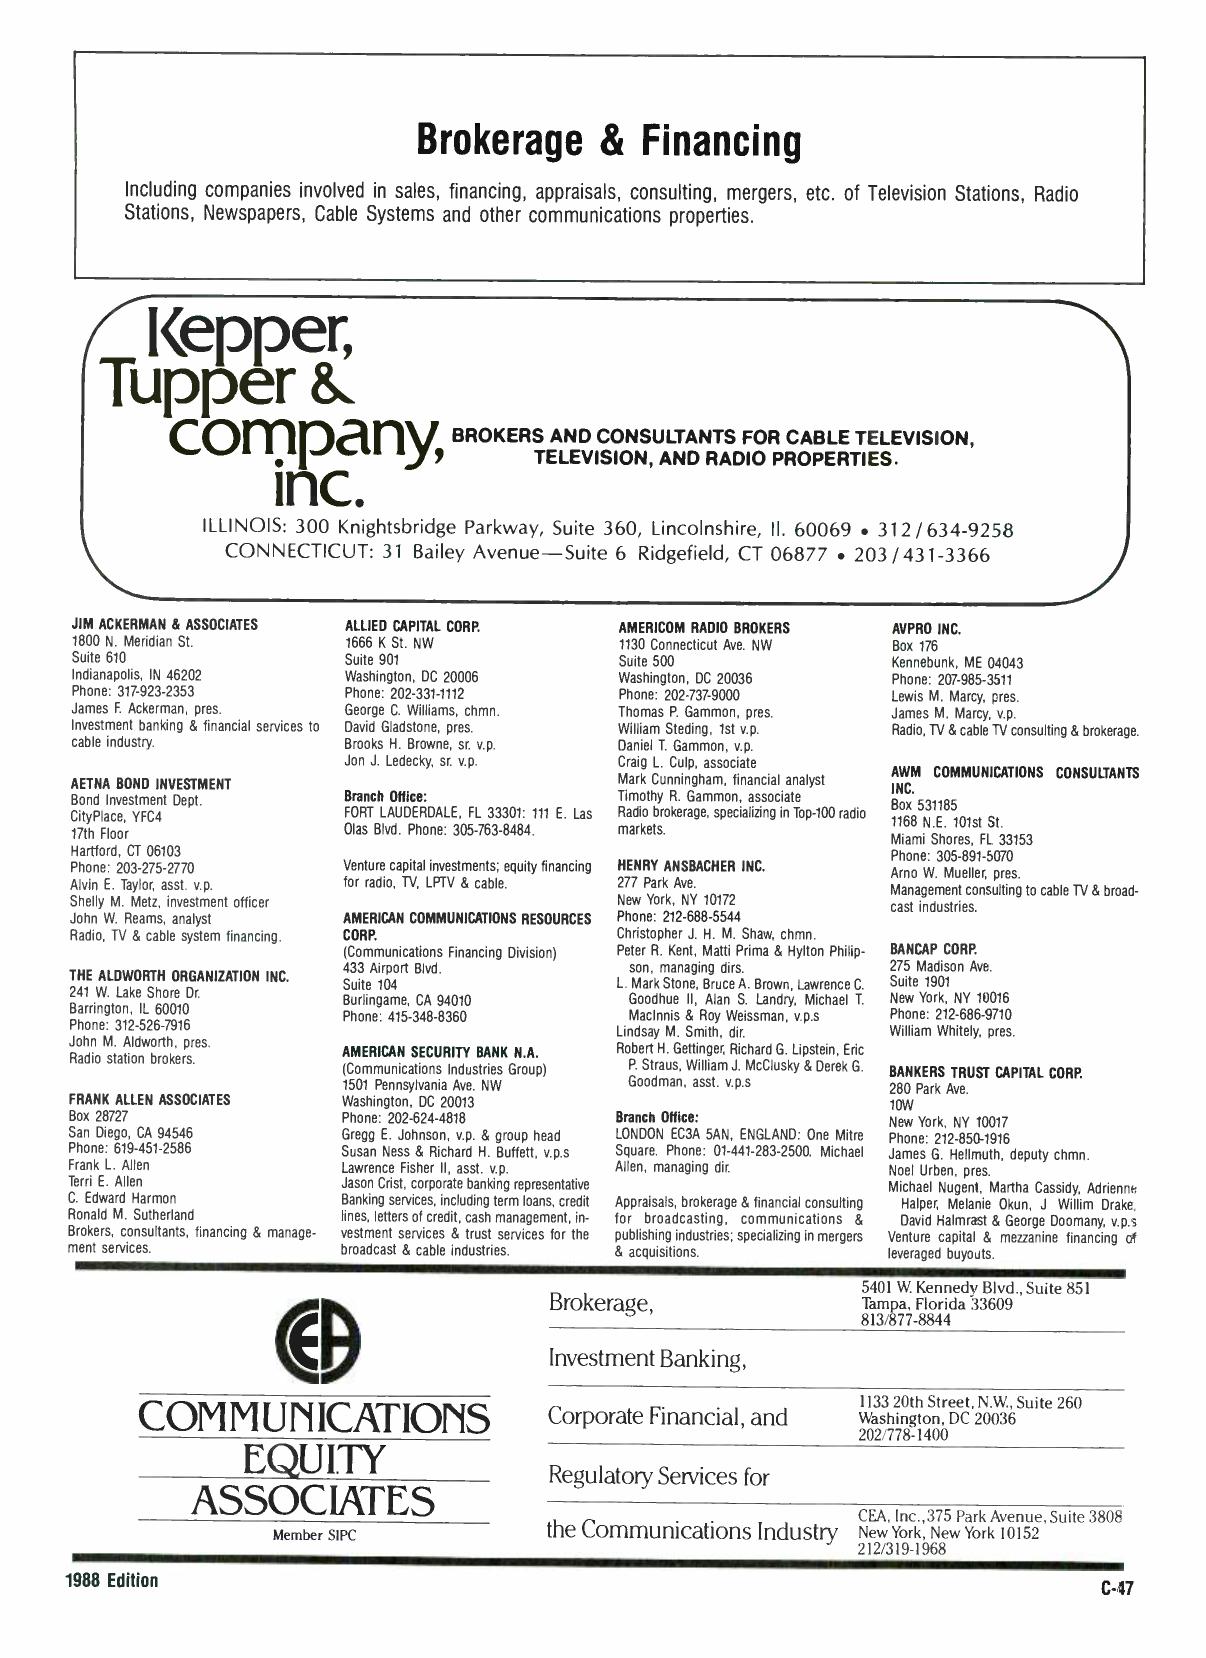 Company American Radio History Tm551279 Diesel Electric 56 Gage 44 Ton 0440 400 Hp Davenport